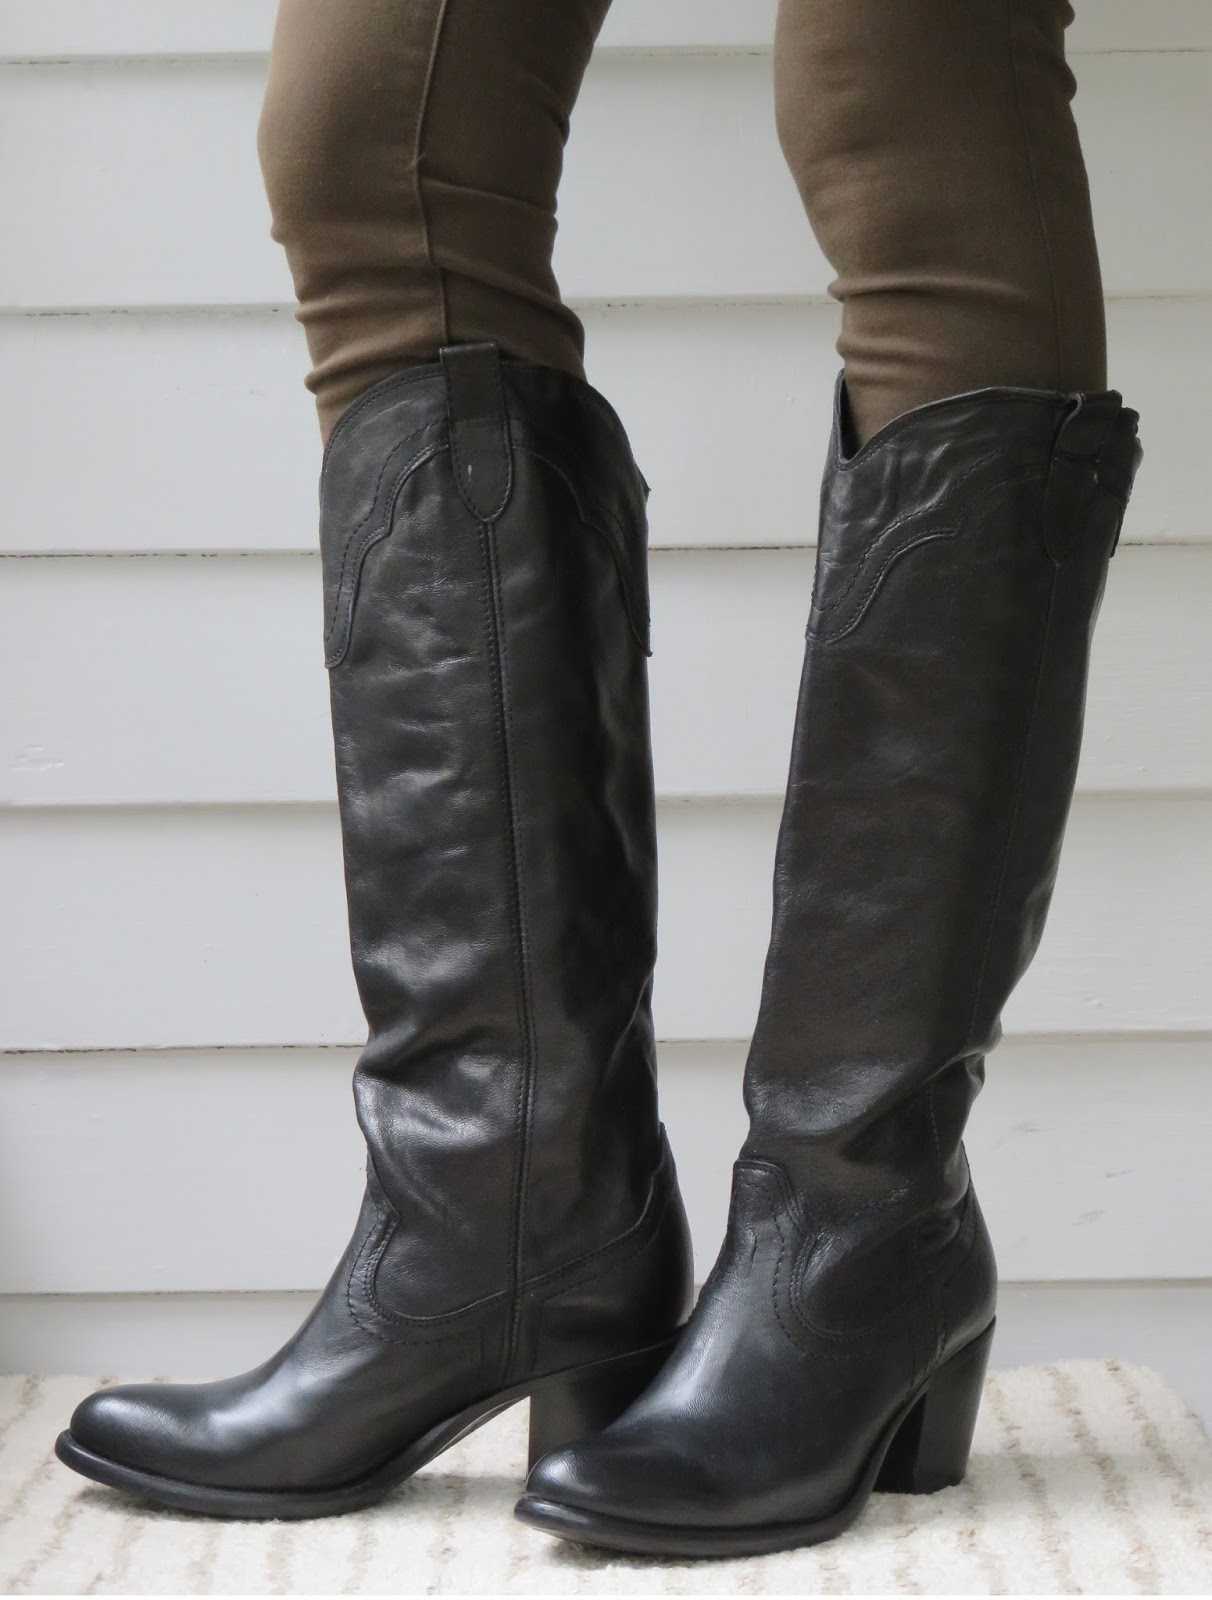 Howdy Slim Riding Boots For Thin Calves Frye Tabitha